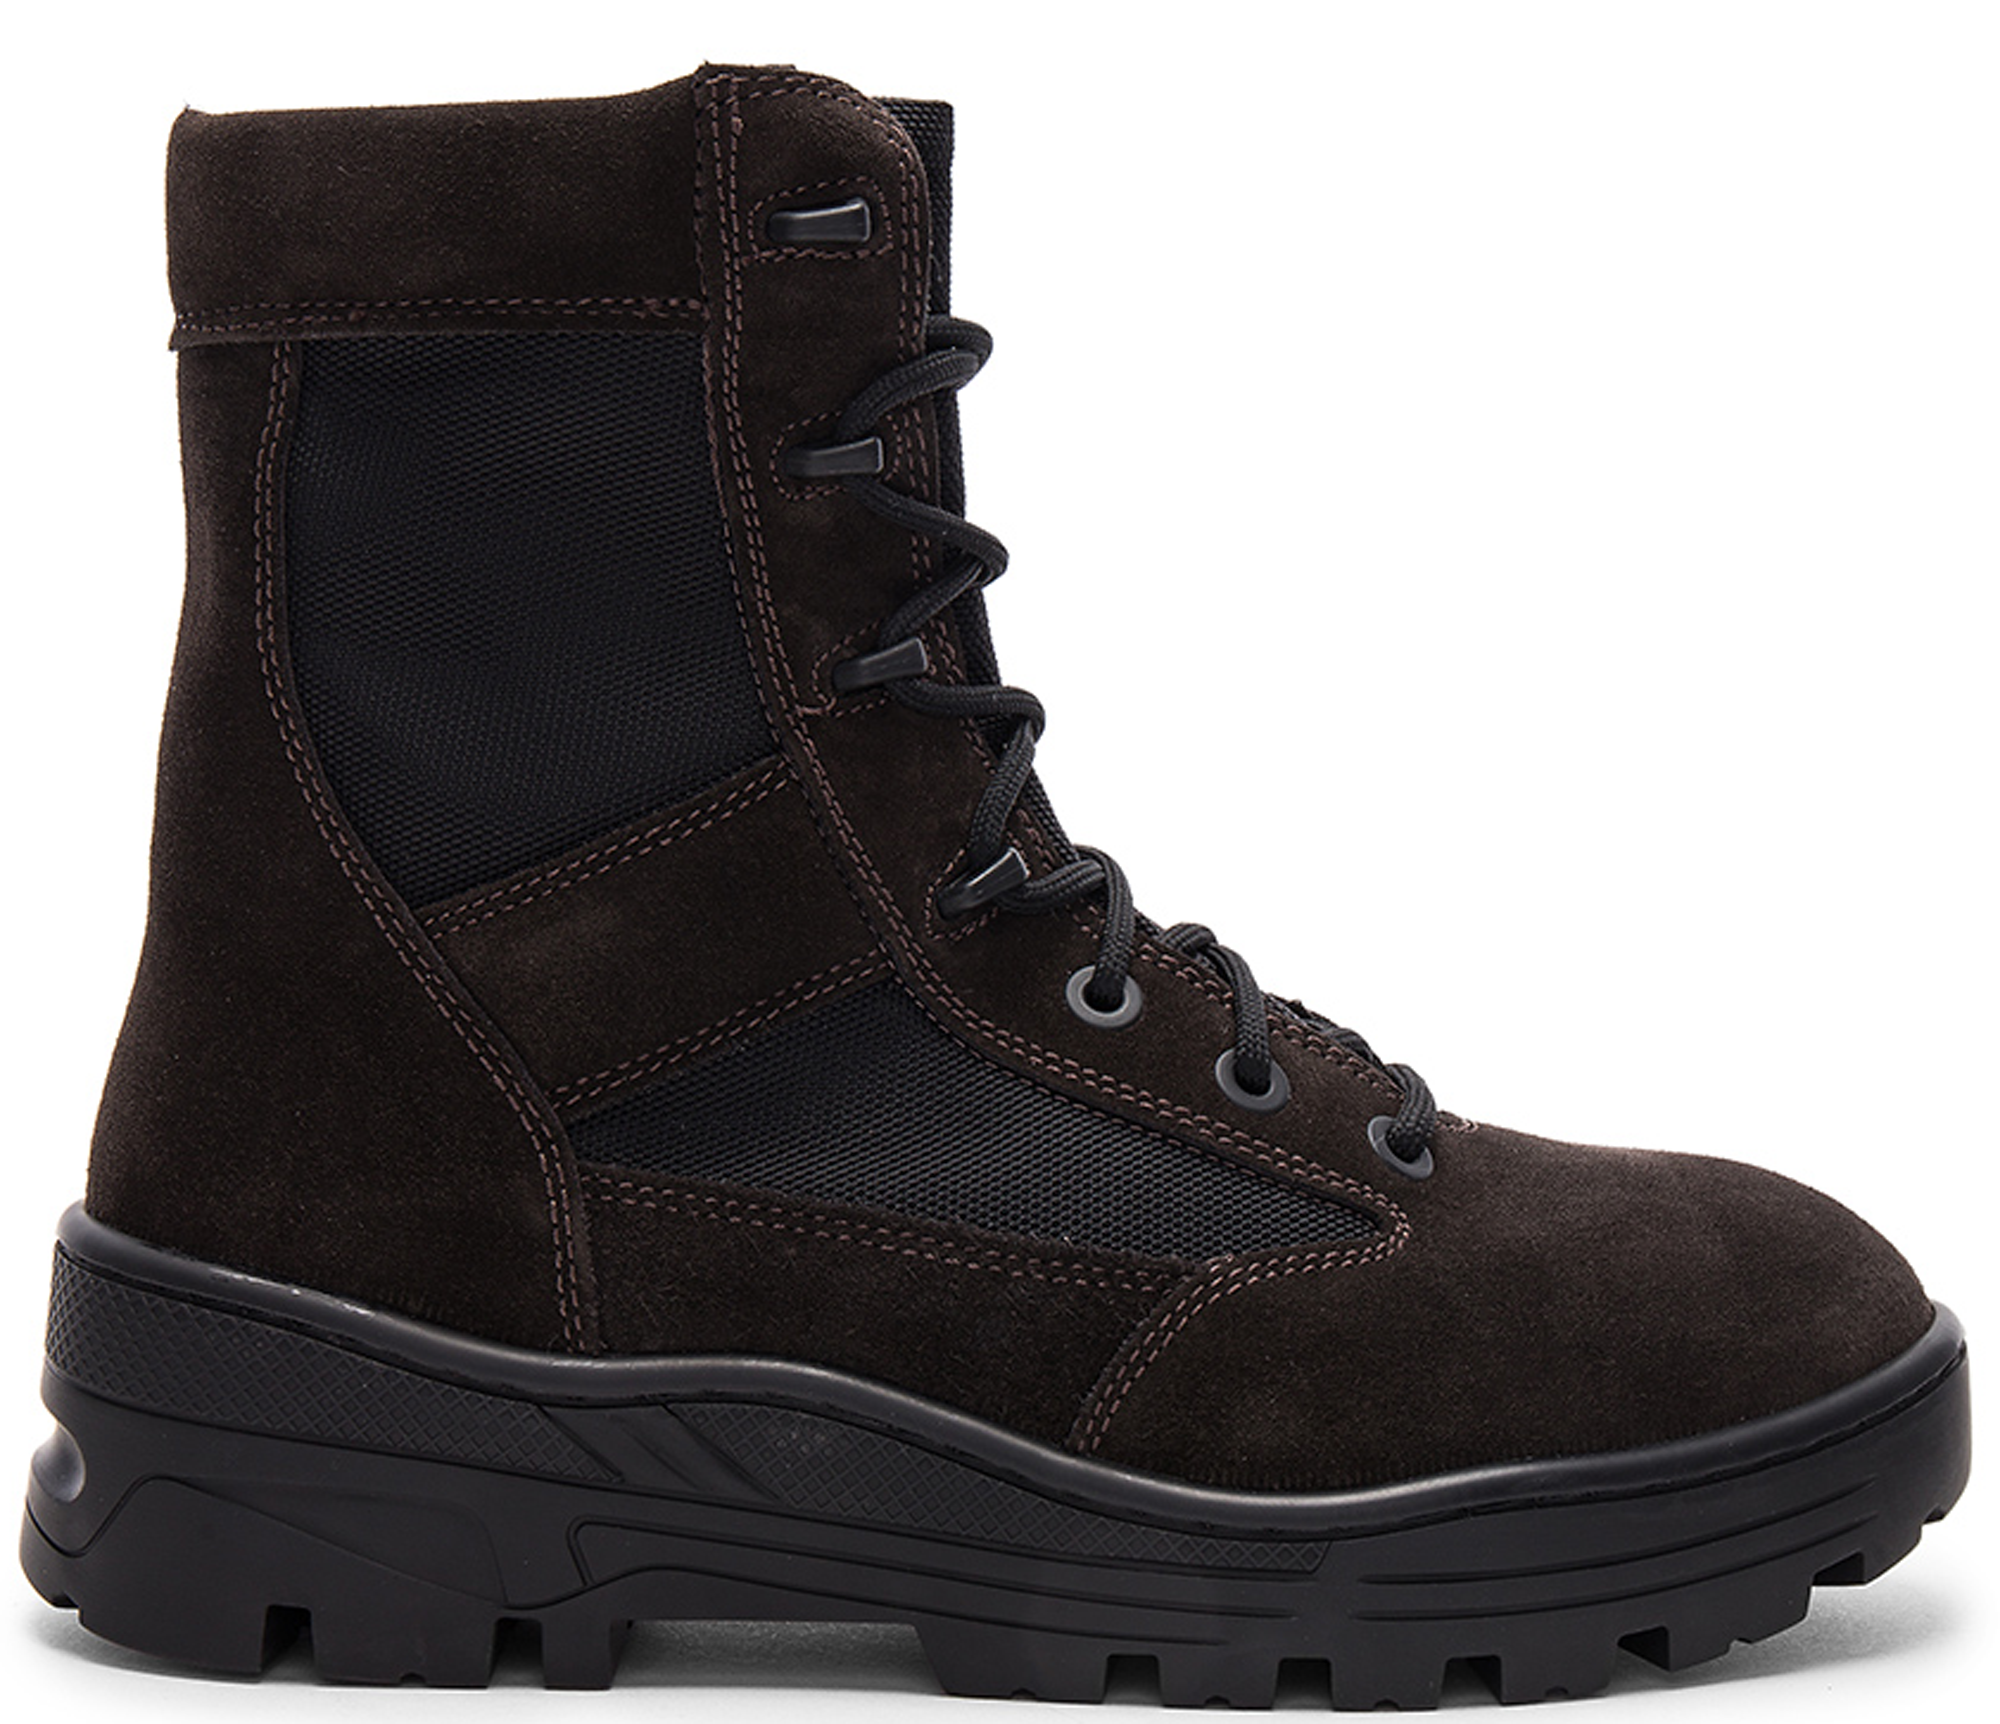 Yeezy Combat Boot Season 4 Oil - KM3605-116